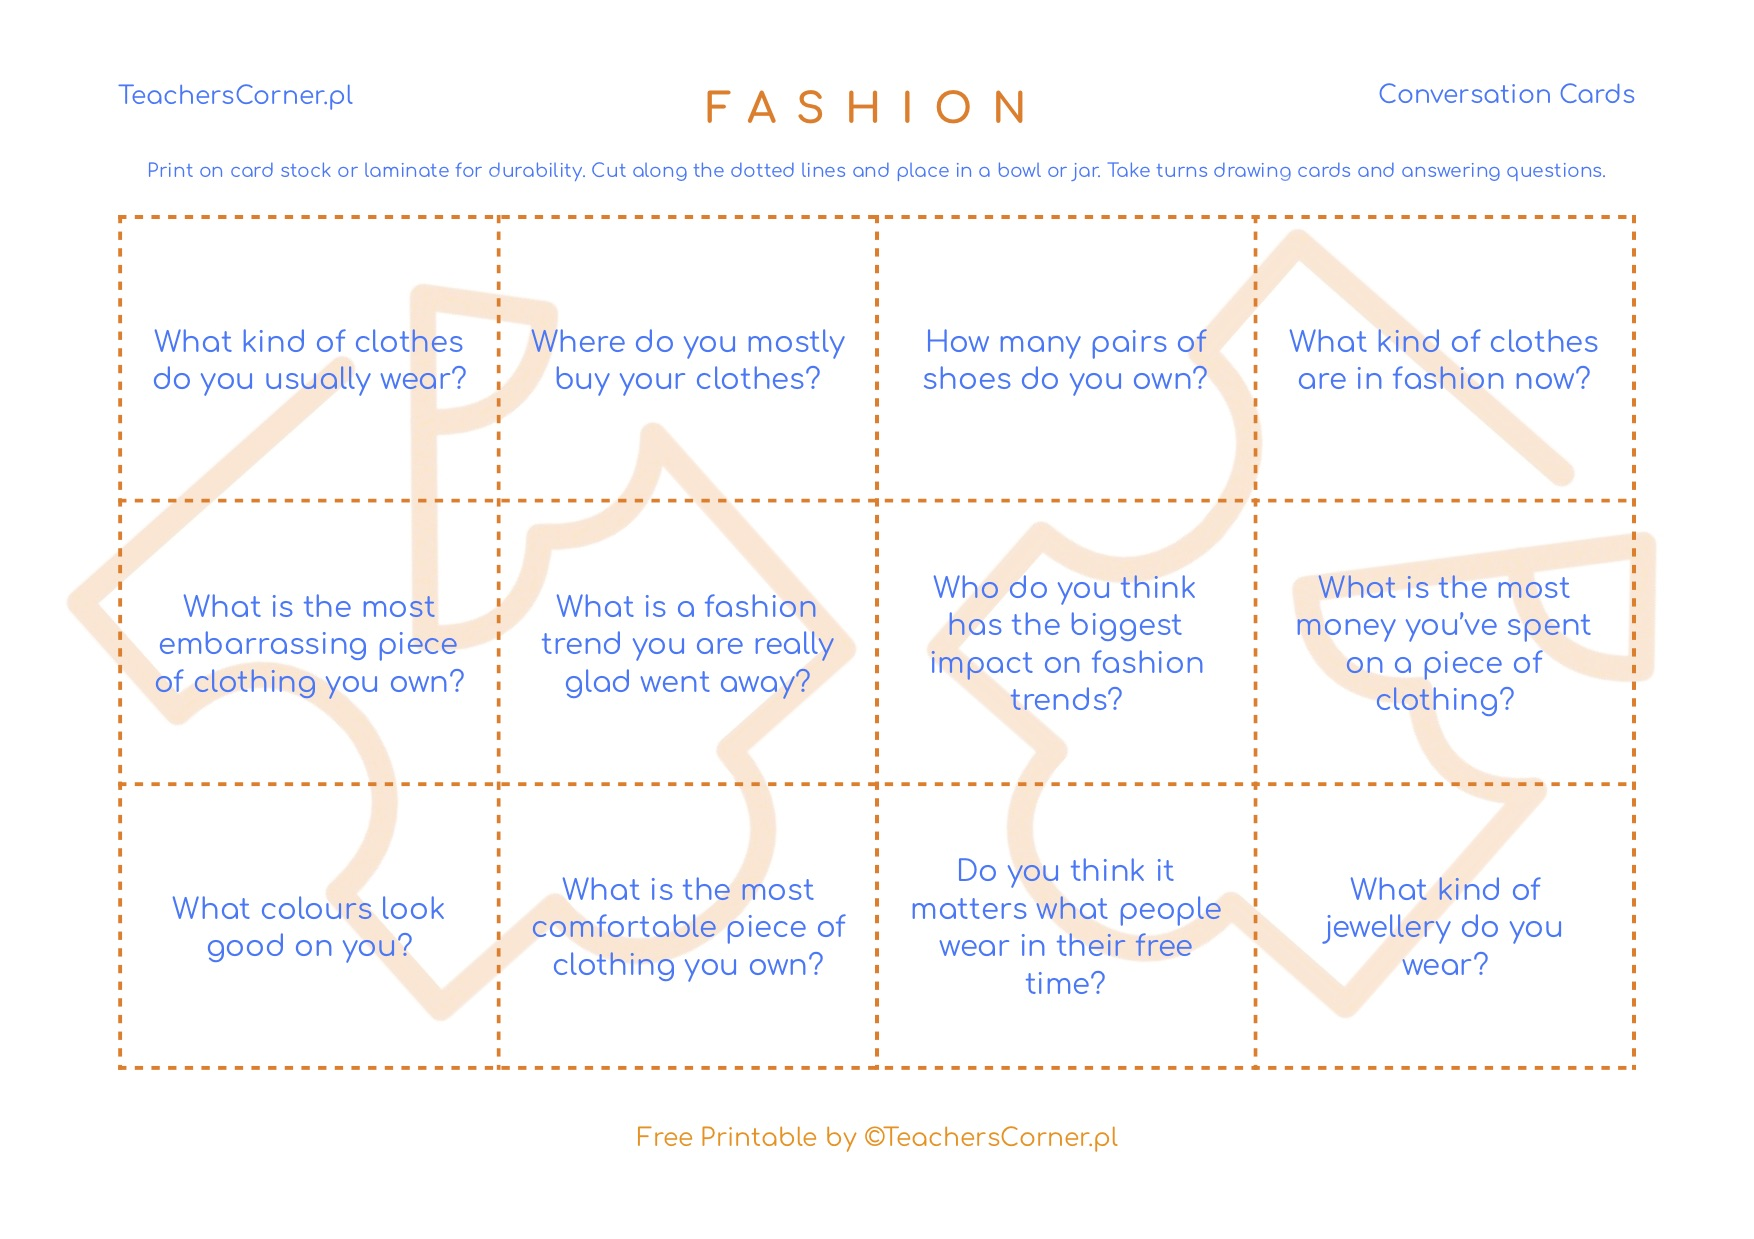 fashion conversation cards